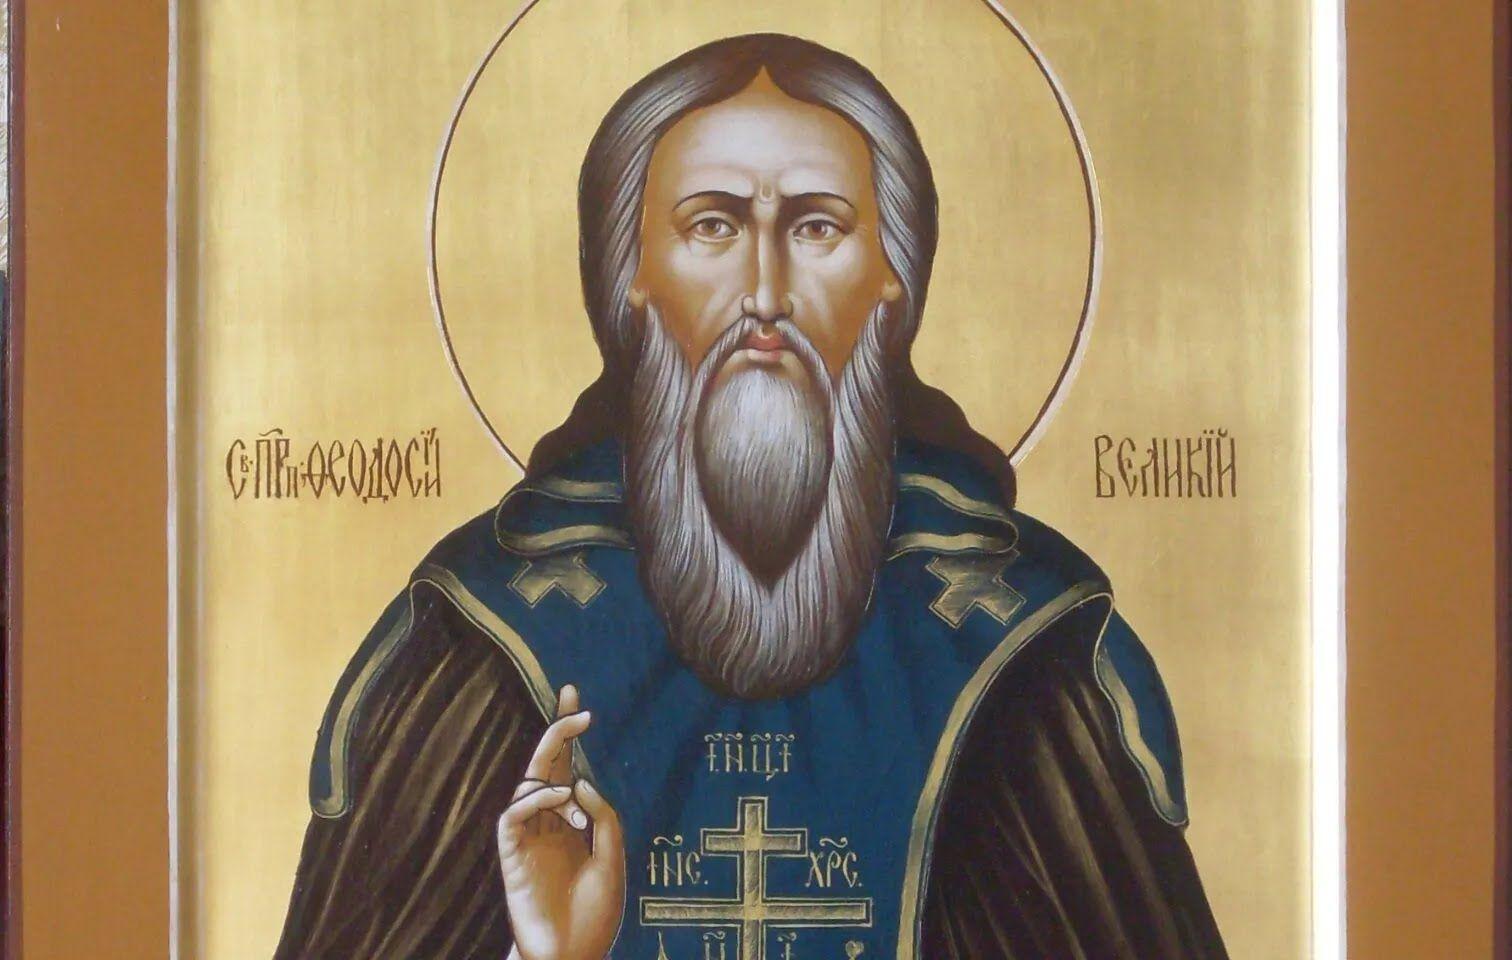 Имя Феодосия в православии соотносят с преподобными Феодосием Киновиархом и мучеником Феодосием Сирмирским.